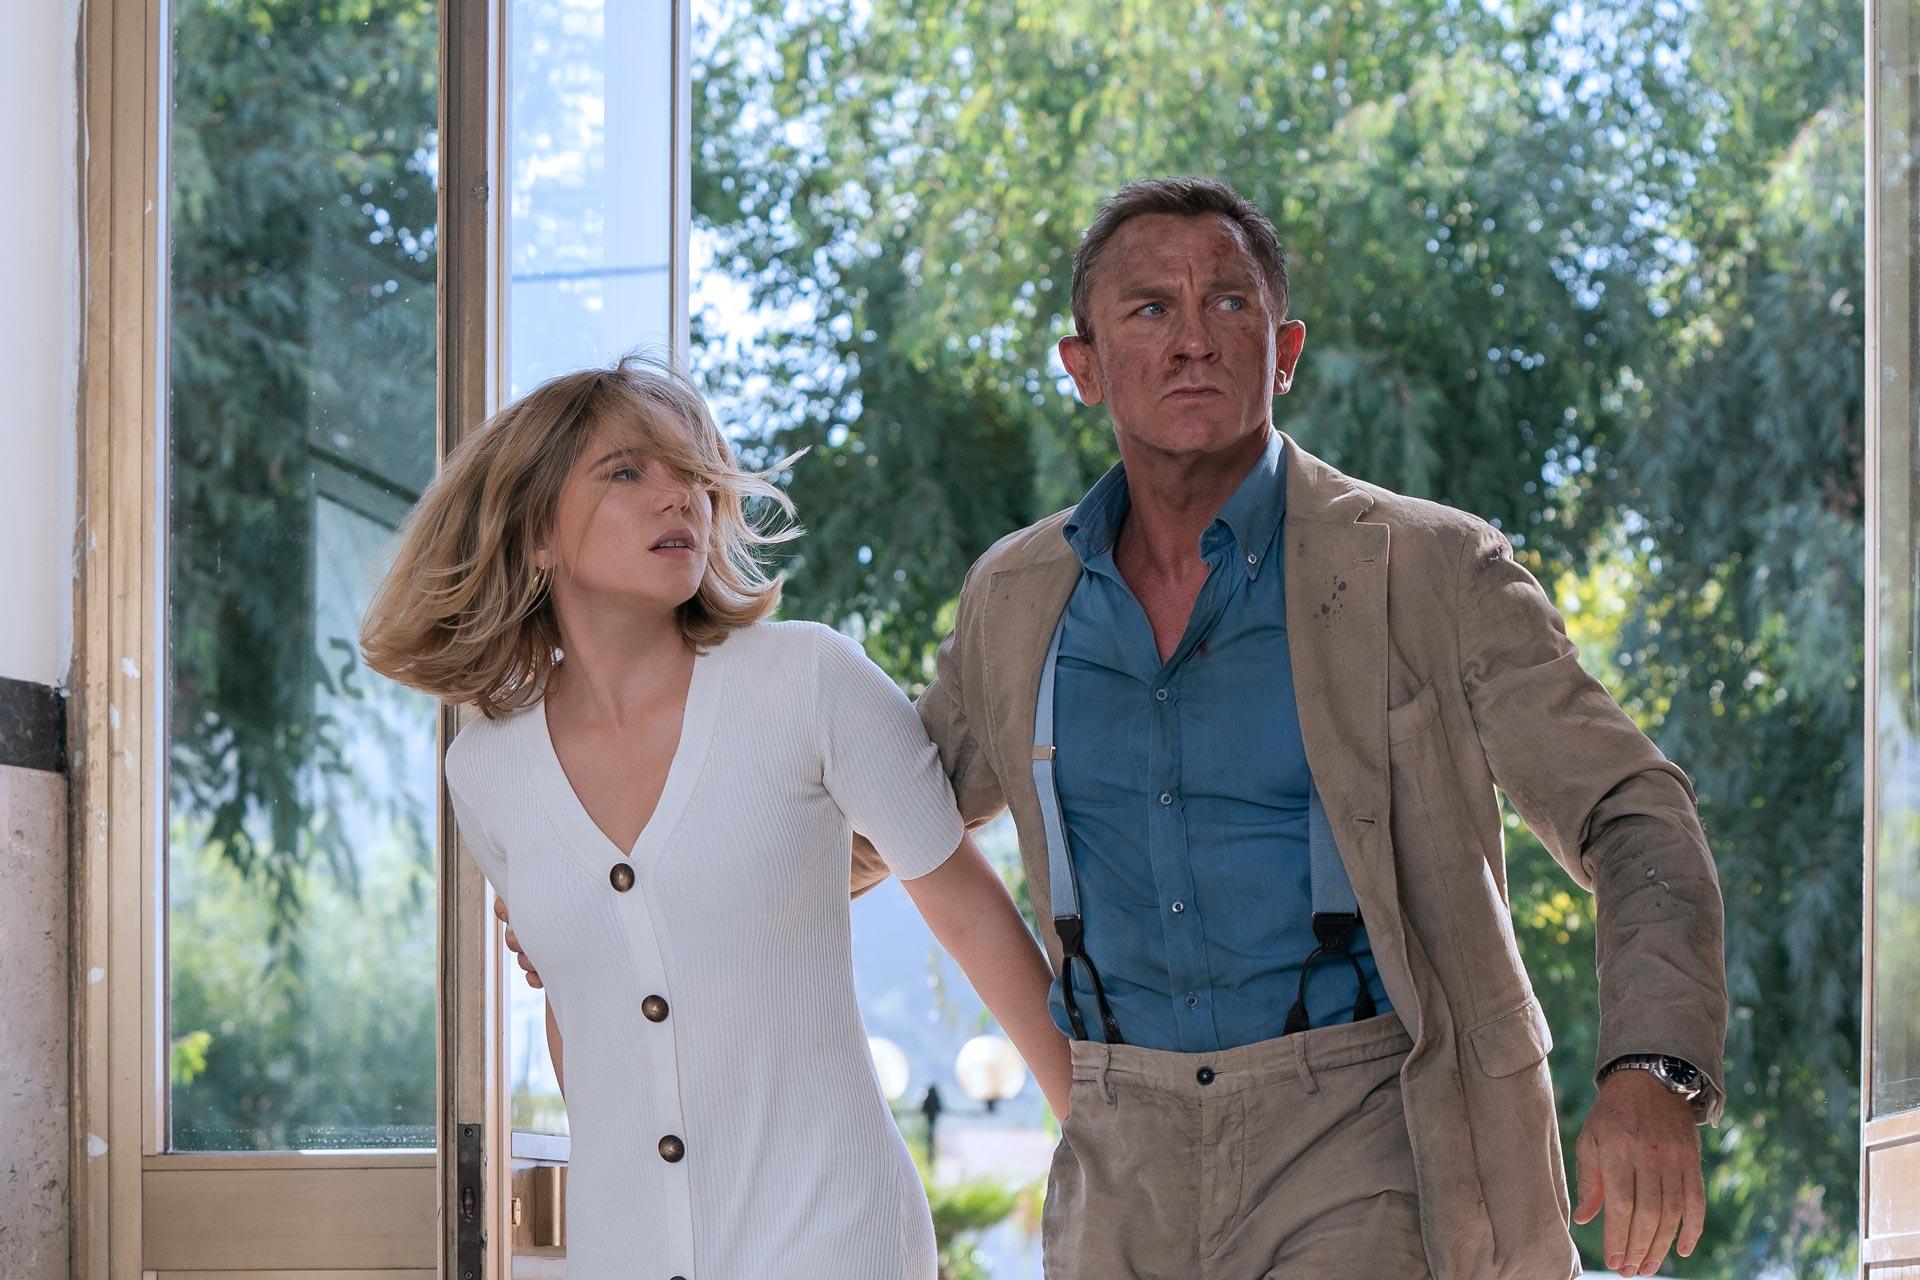 No Time to Die ending in which Daniel Craig James Bond must change or die, and he dies death